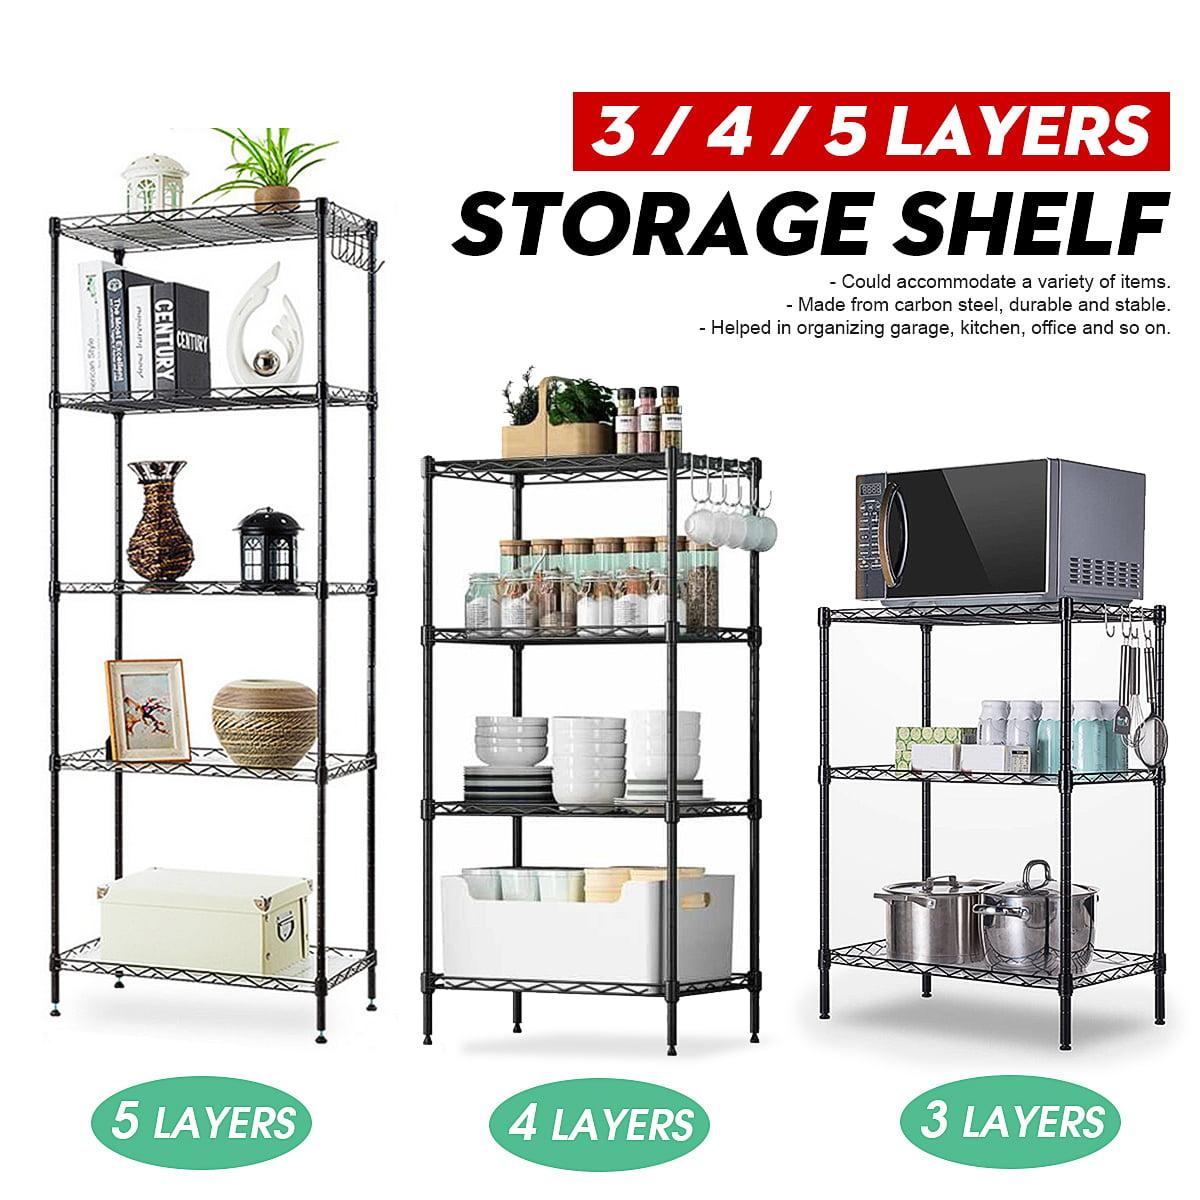 3 Tier Bathroom Kitchen Shelf Metal Shelving Storage Rack Garage Steel Stand New